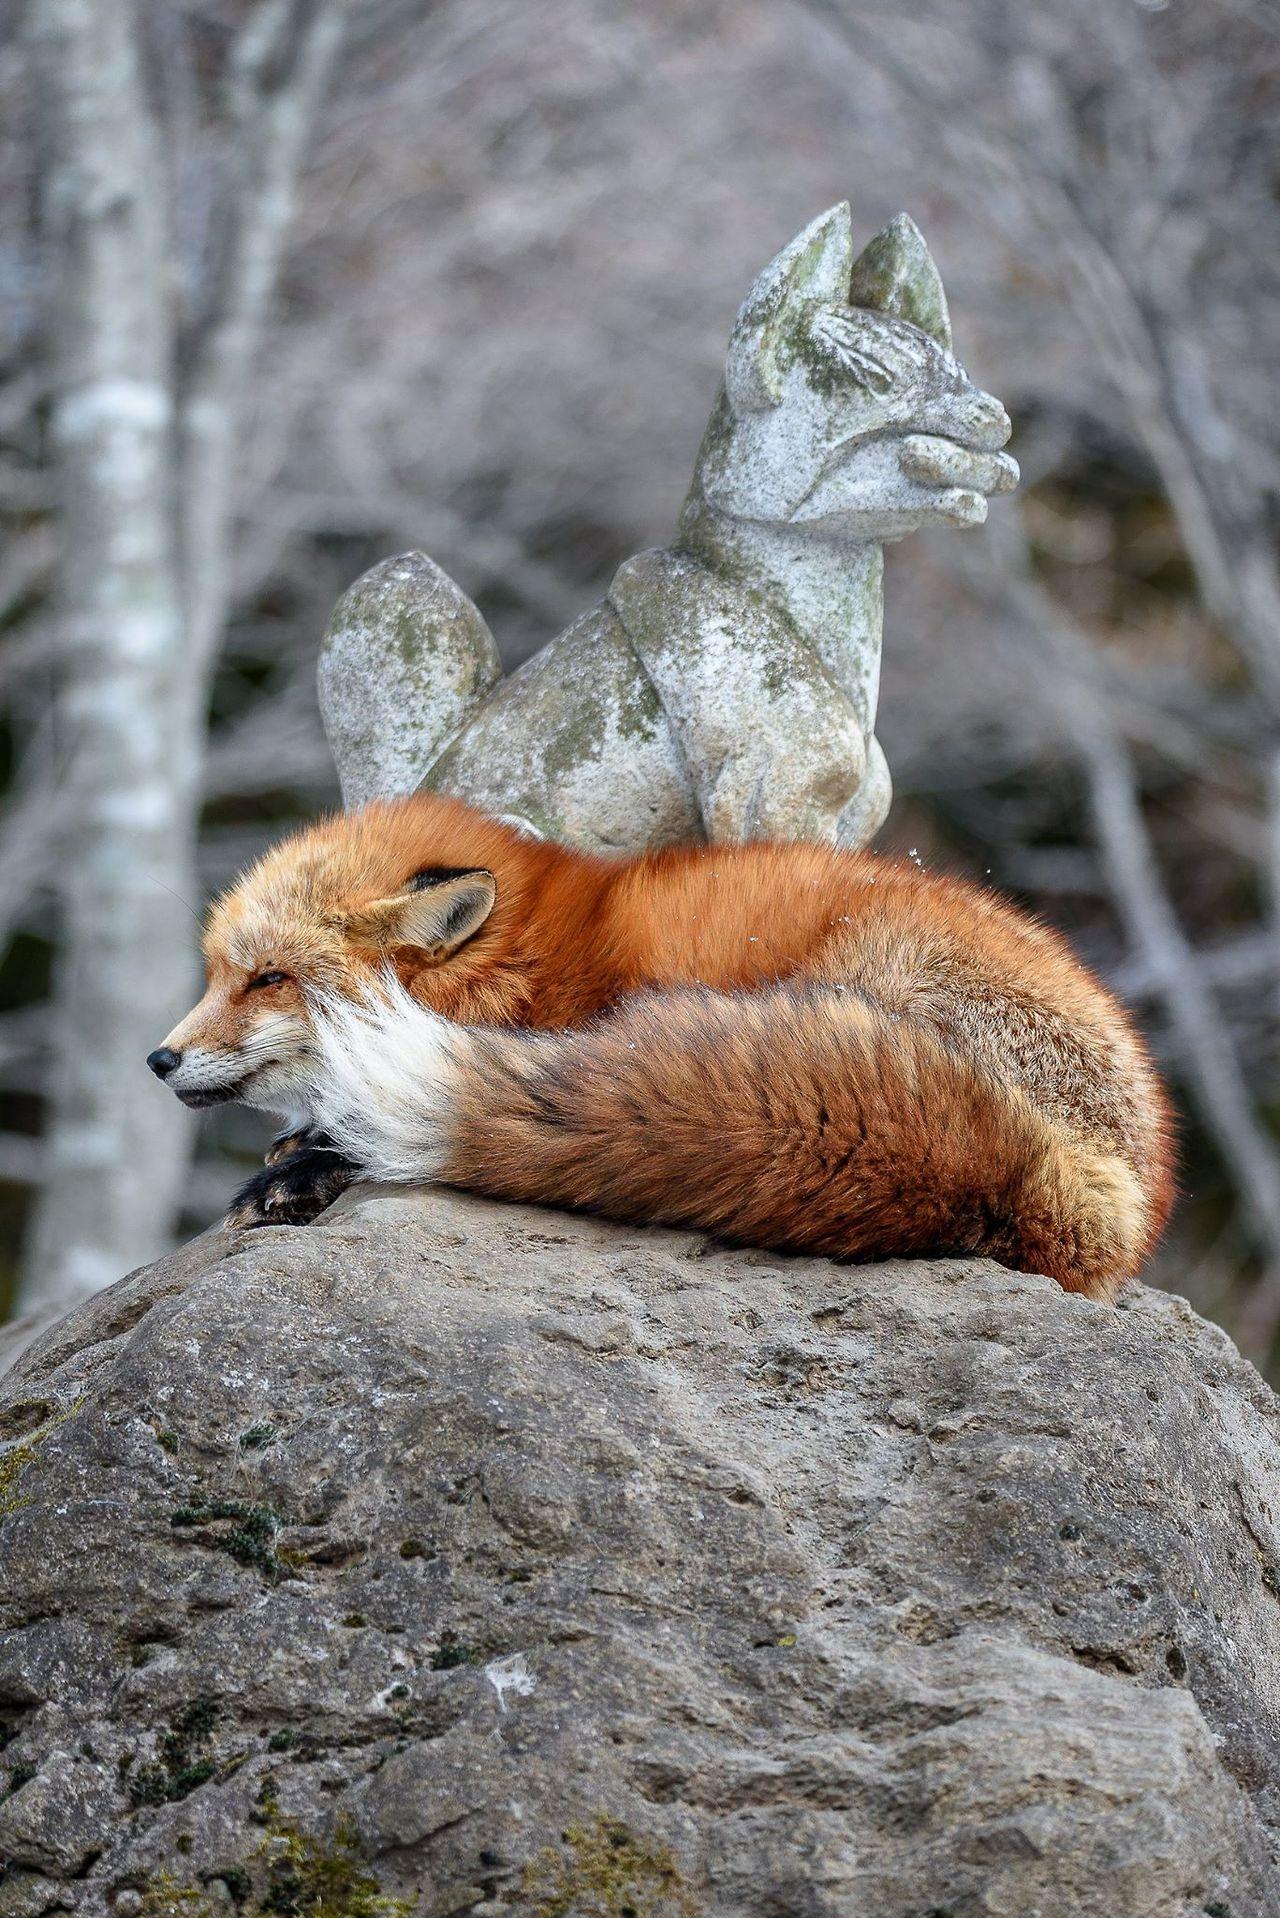 Red Fox by Godimus Michel | Zao Fox Village in Japan